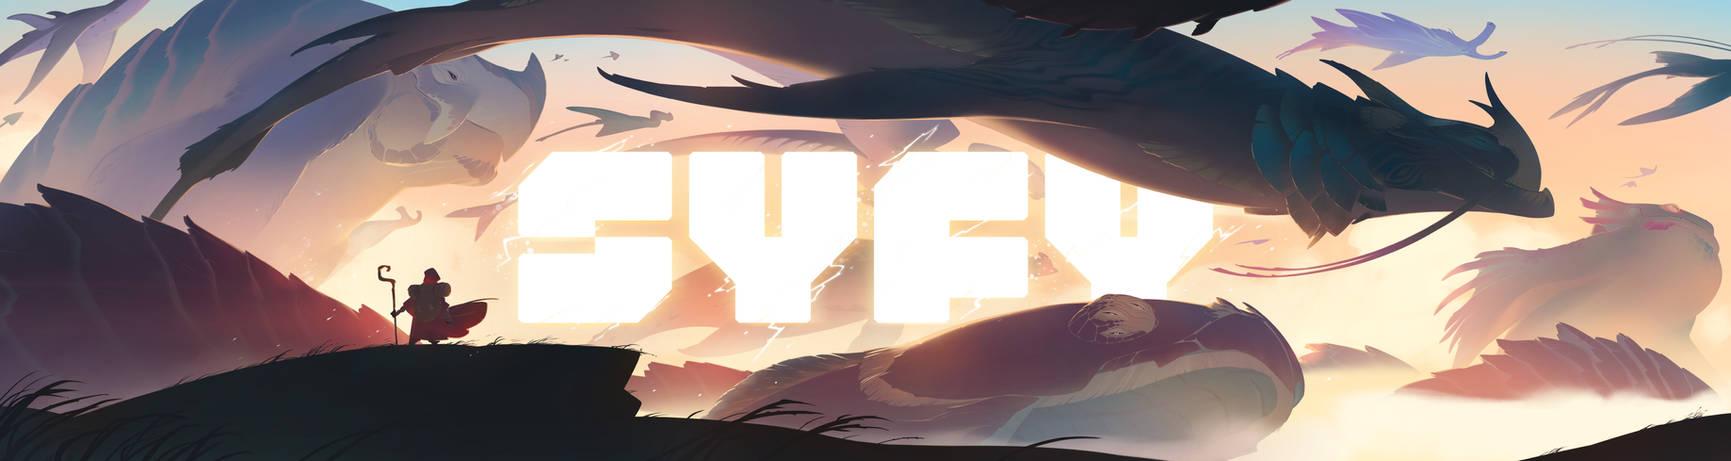 SYFY/SDCC promotion: Migrating Titans